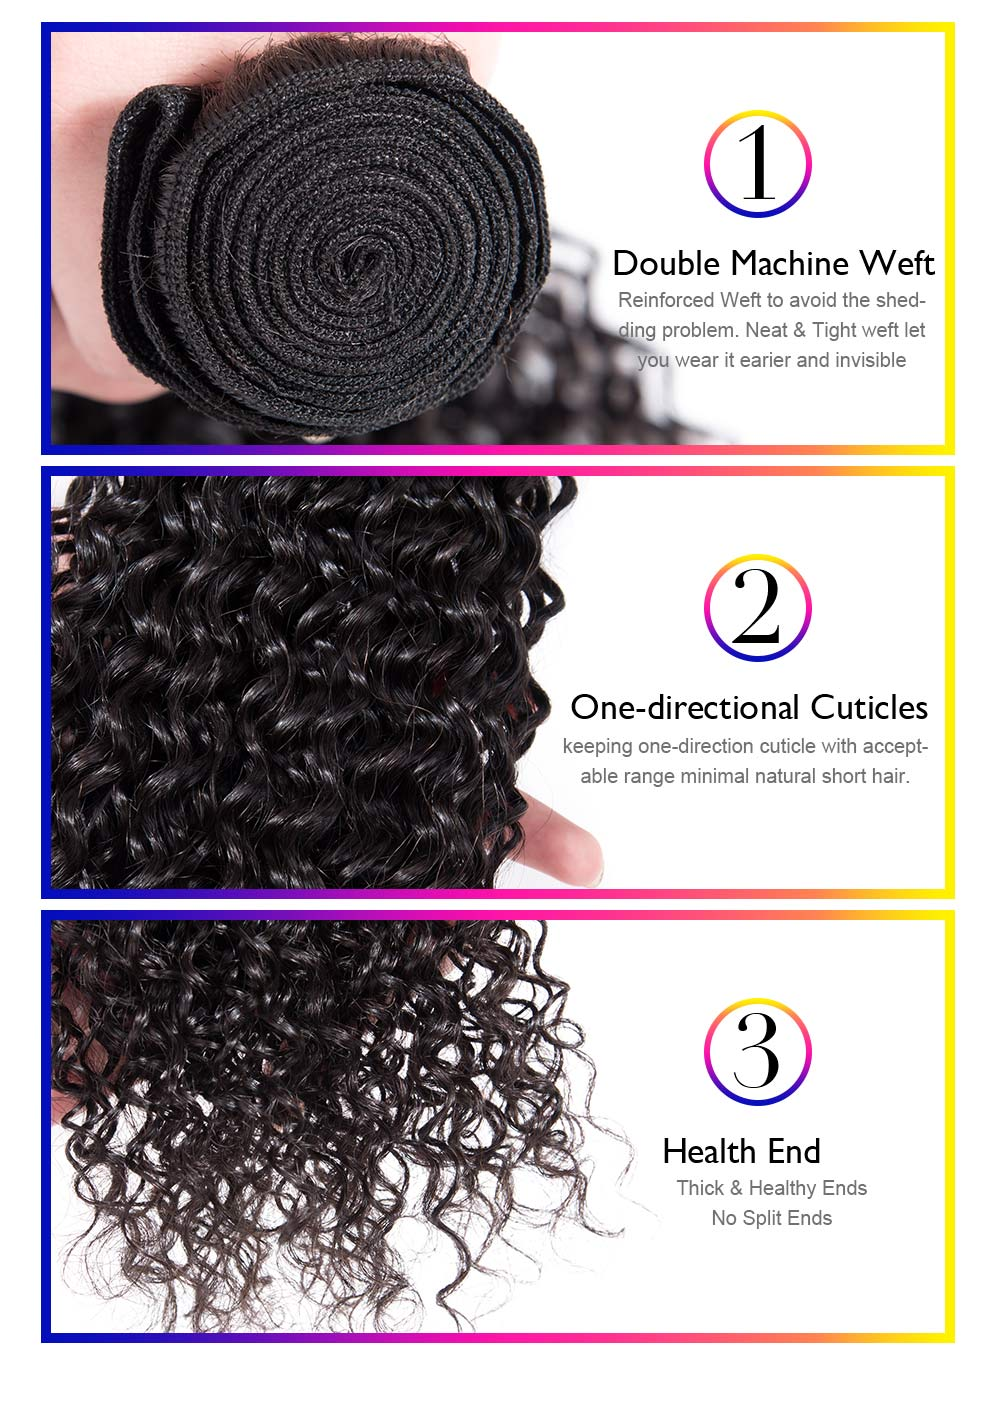 bundles curly bundles kinky bundle hair Cheap bundles curly High Quality bundles kinky China bundle hair Suppliers Originea Hair 3bundles Mongolian Kinky Curly Hair Bundles 100 Human Hair Bundles Hair Extensions Weaving for hair salon